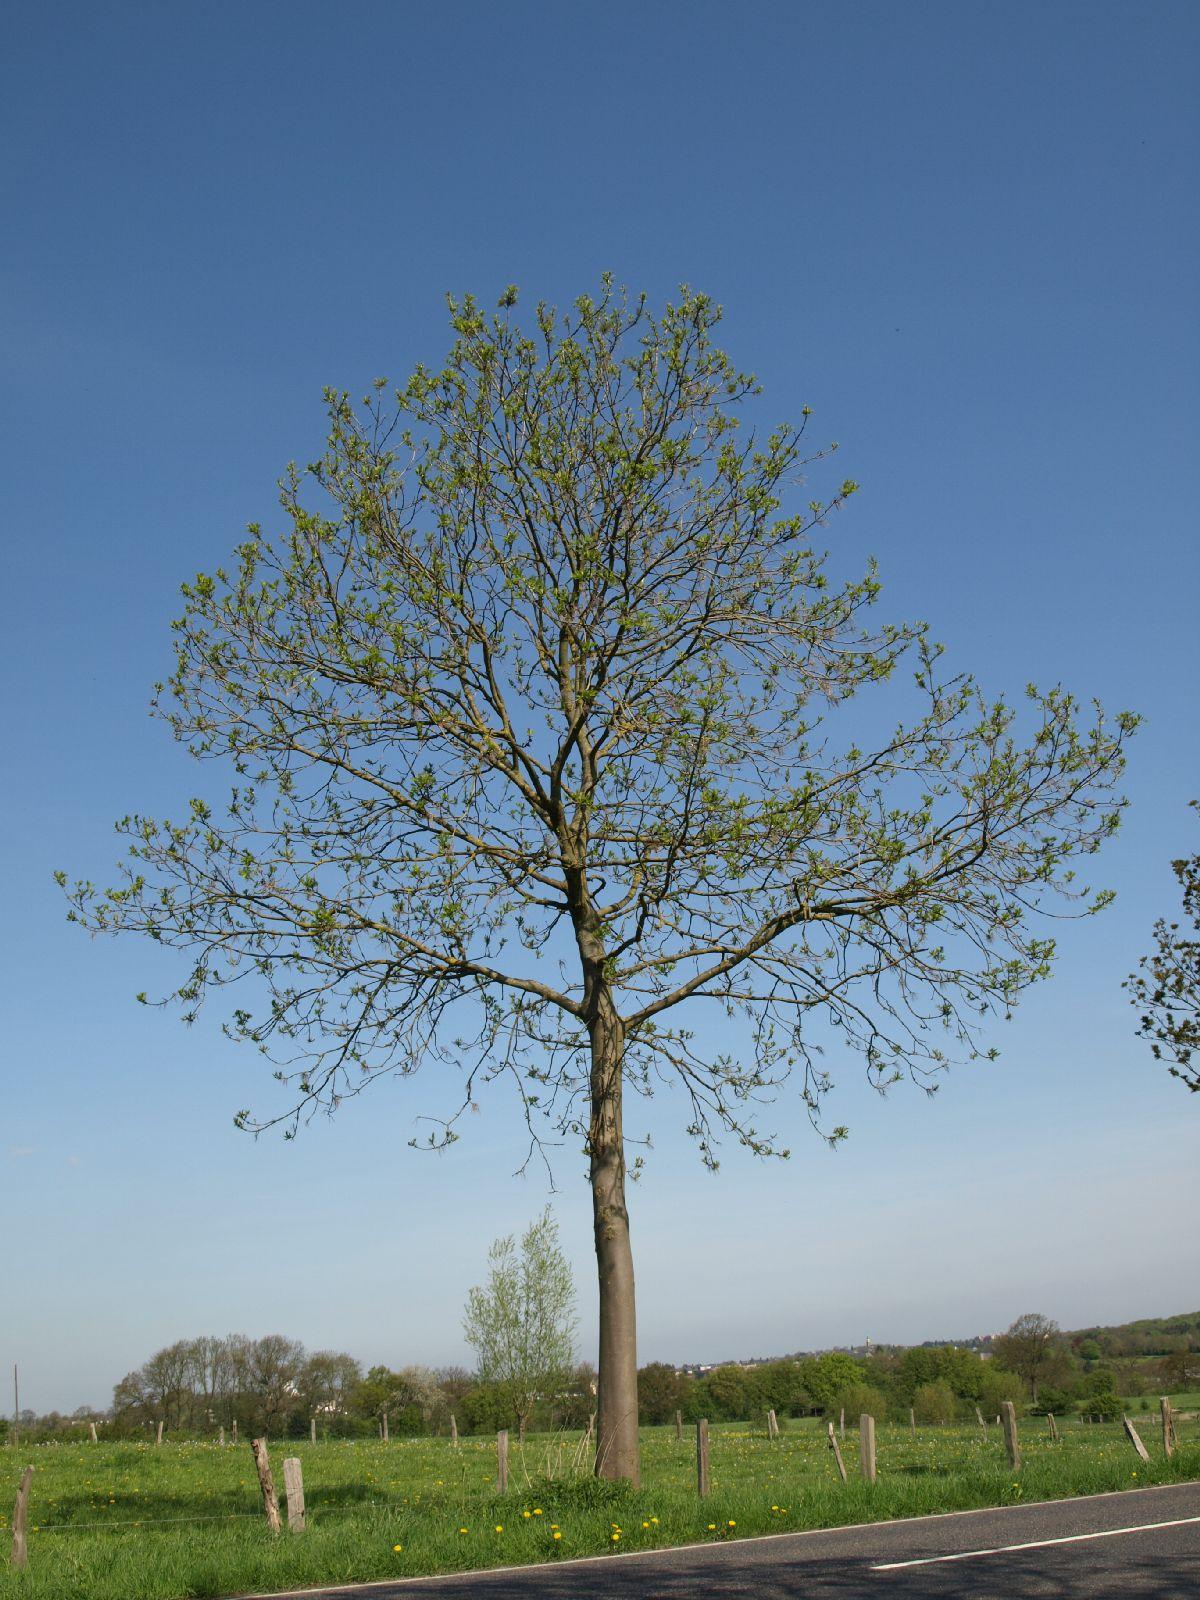 Pflanzen-Baum-Foto_Textur_B_P5032321